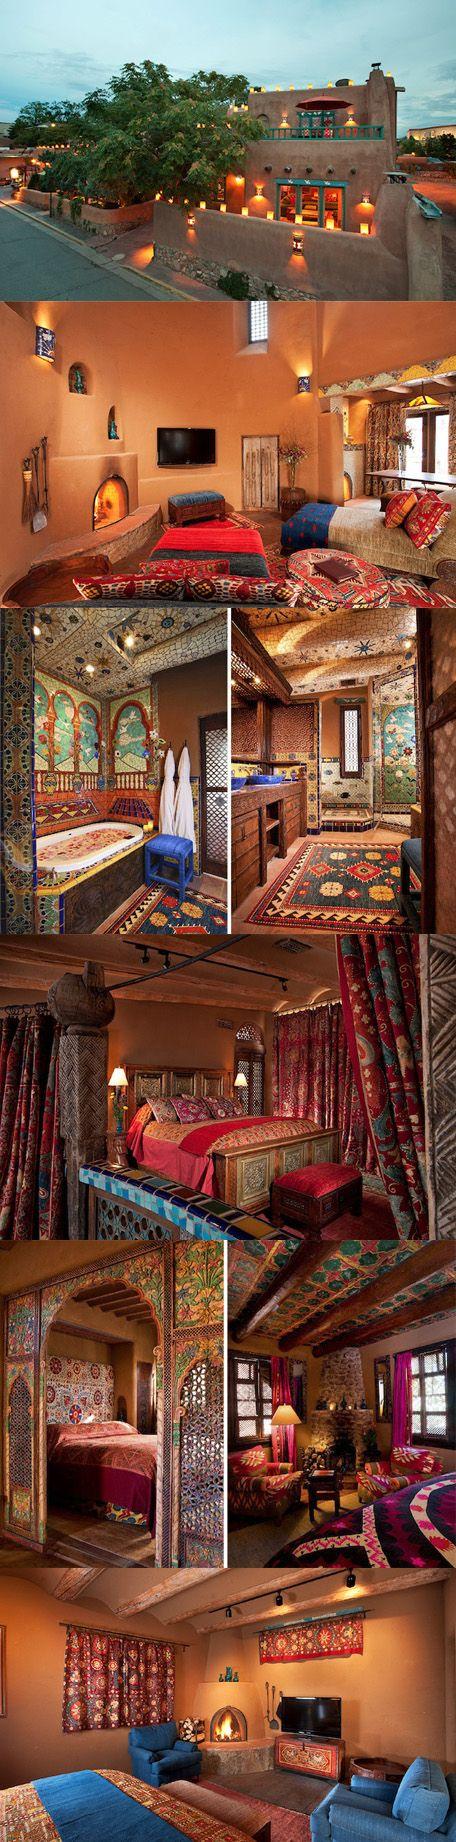 Inn of the Five Graces, Santa Fe, NM…